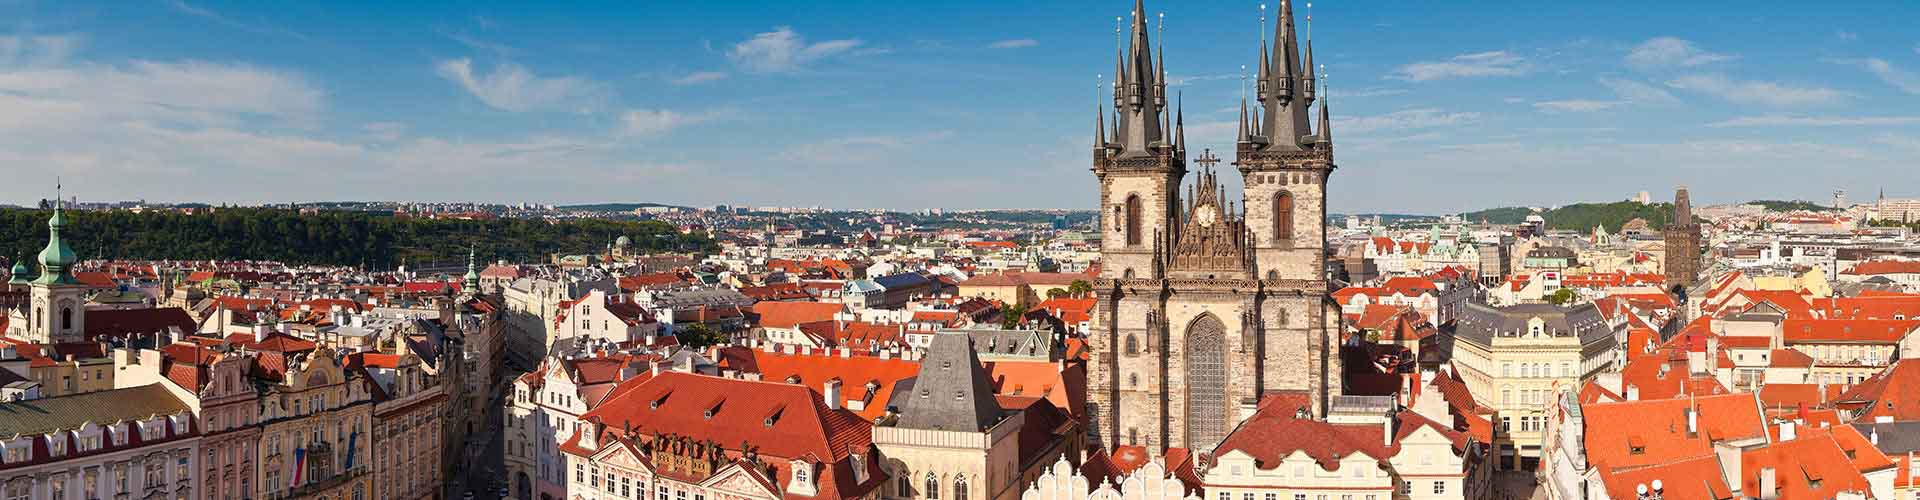 Praga - Hostales cerca a Iglesia de Tyn. Mapas de Praga, Fotos y comentarios de cada Hostal en Praga.